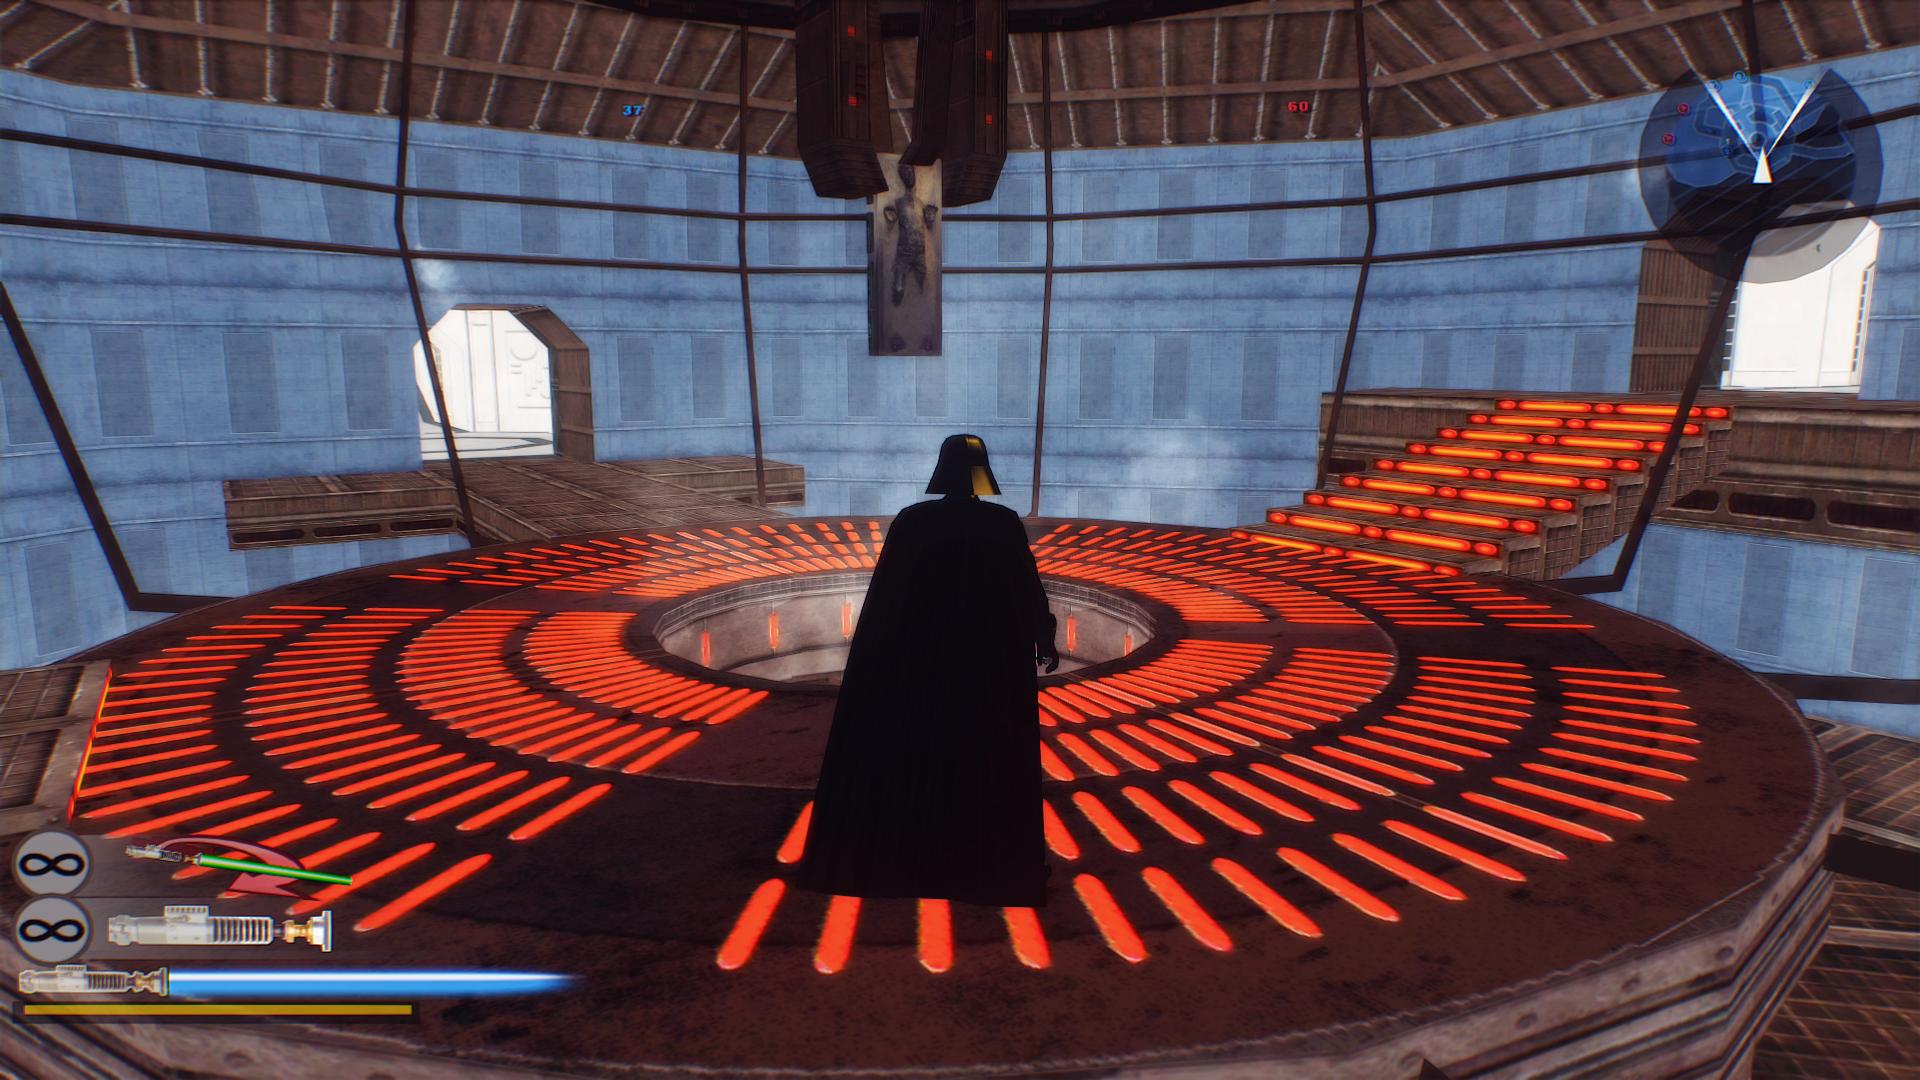 Battlefront 2 Darth Vader Bespin 2017 Graphics Mod